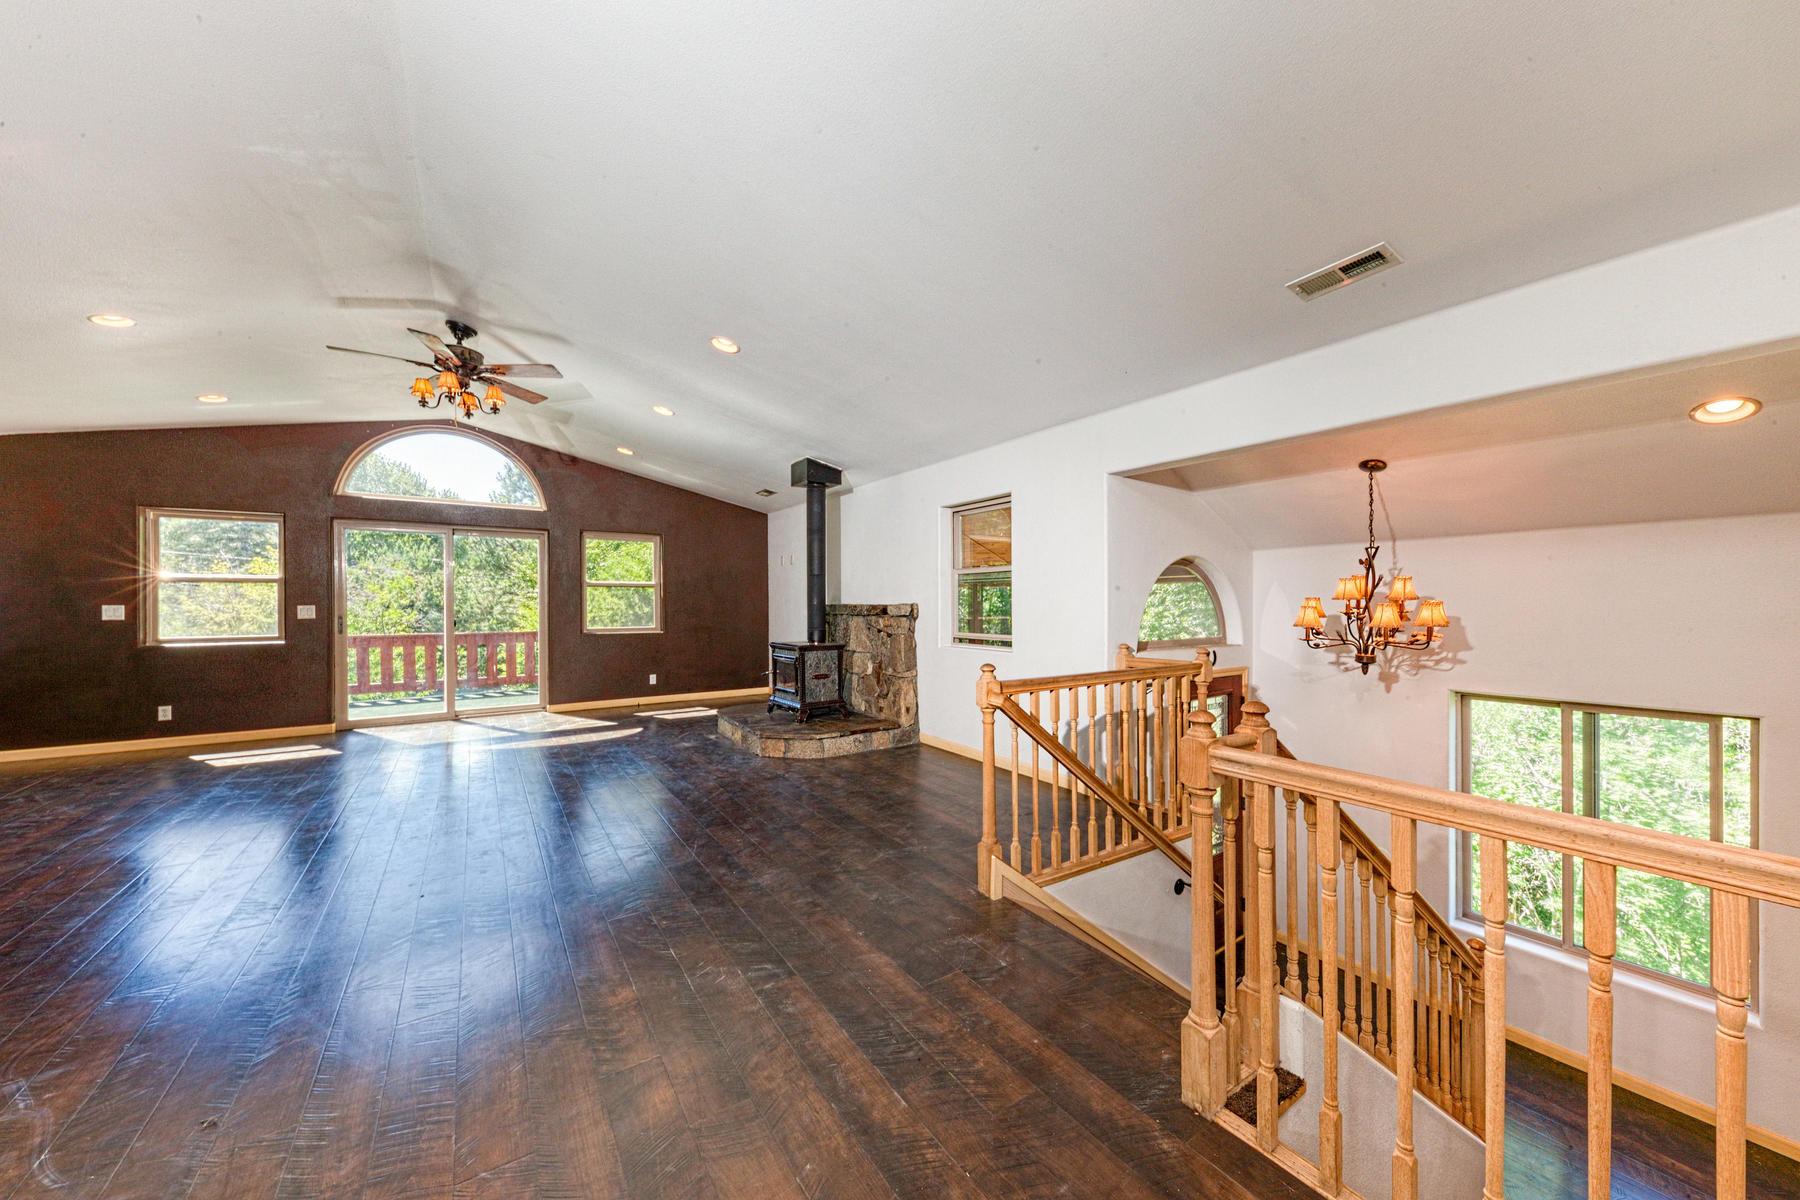 Additional photo for property listing at 538 S Lincoln, Sierraville, CA 538 S Lincoln Sierraville, California 96126 Estados Unidos